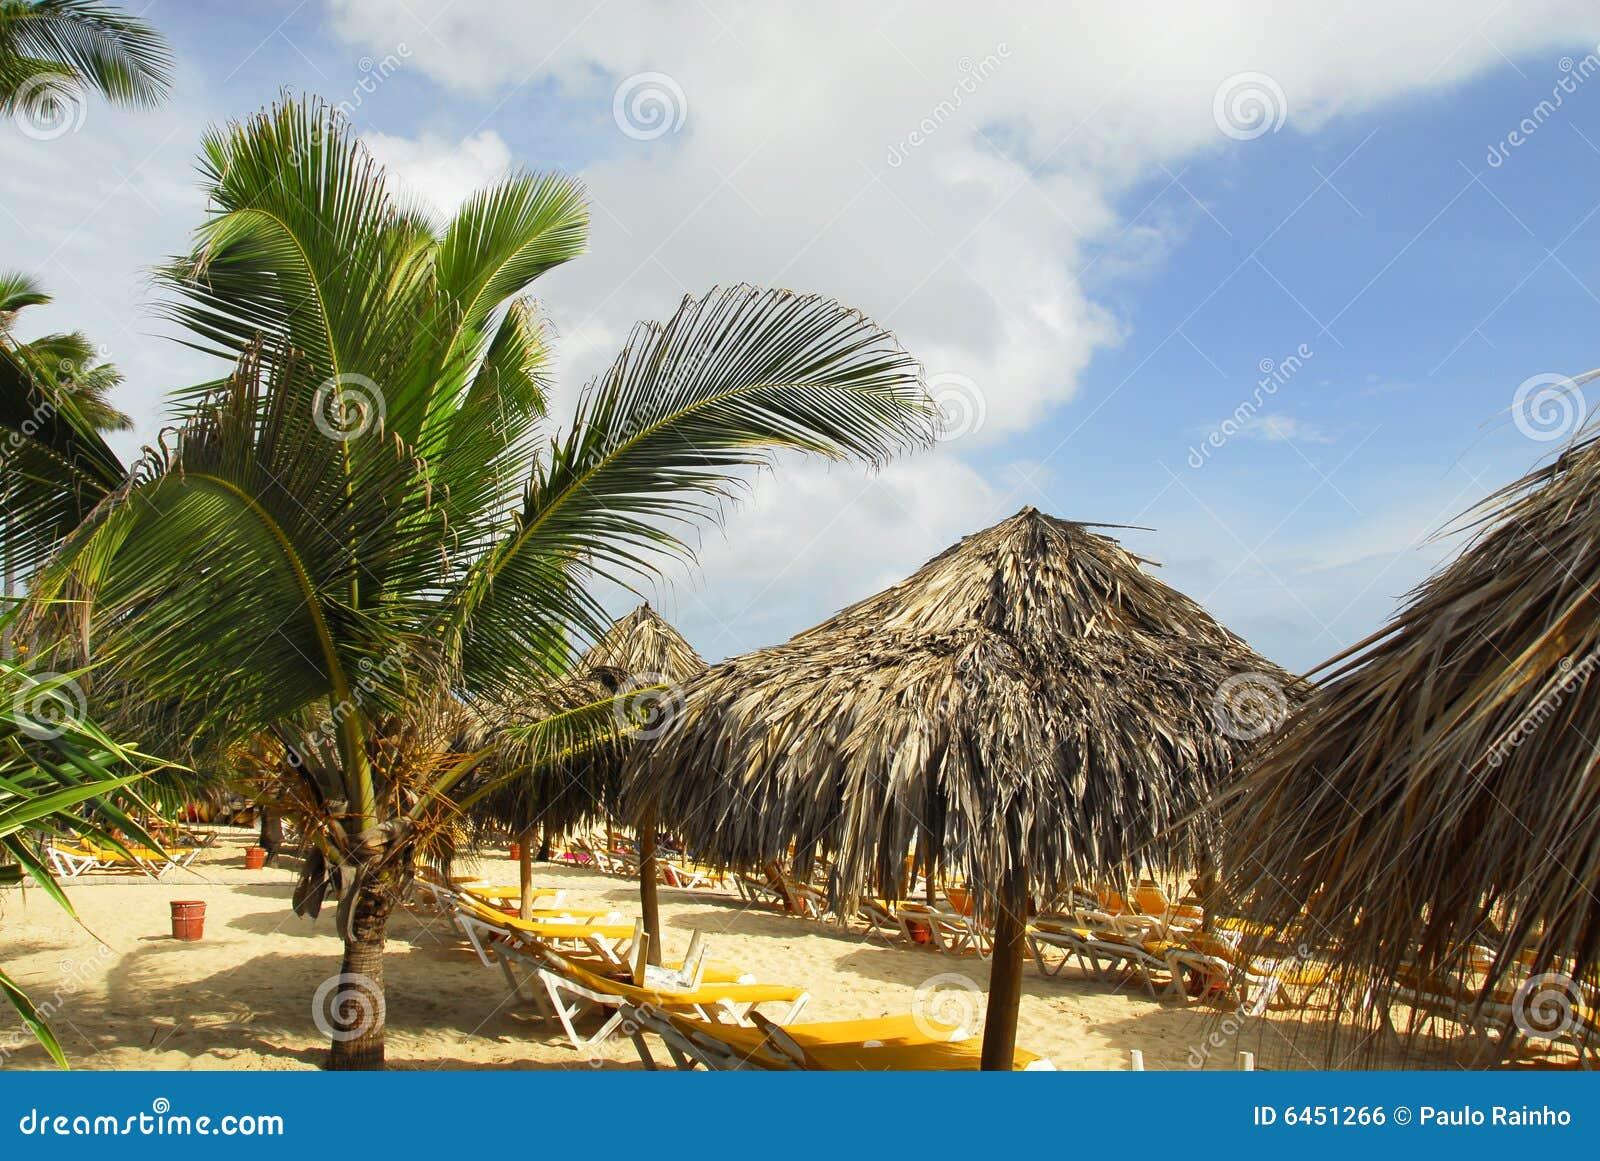 Punta cana kurort tropical